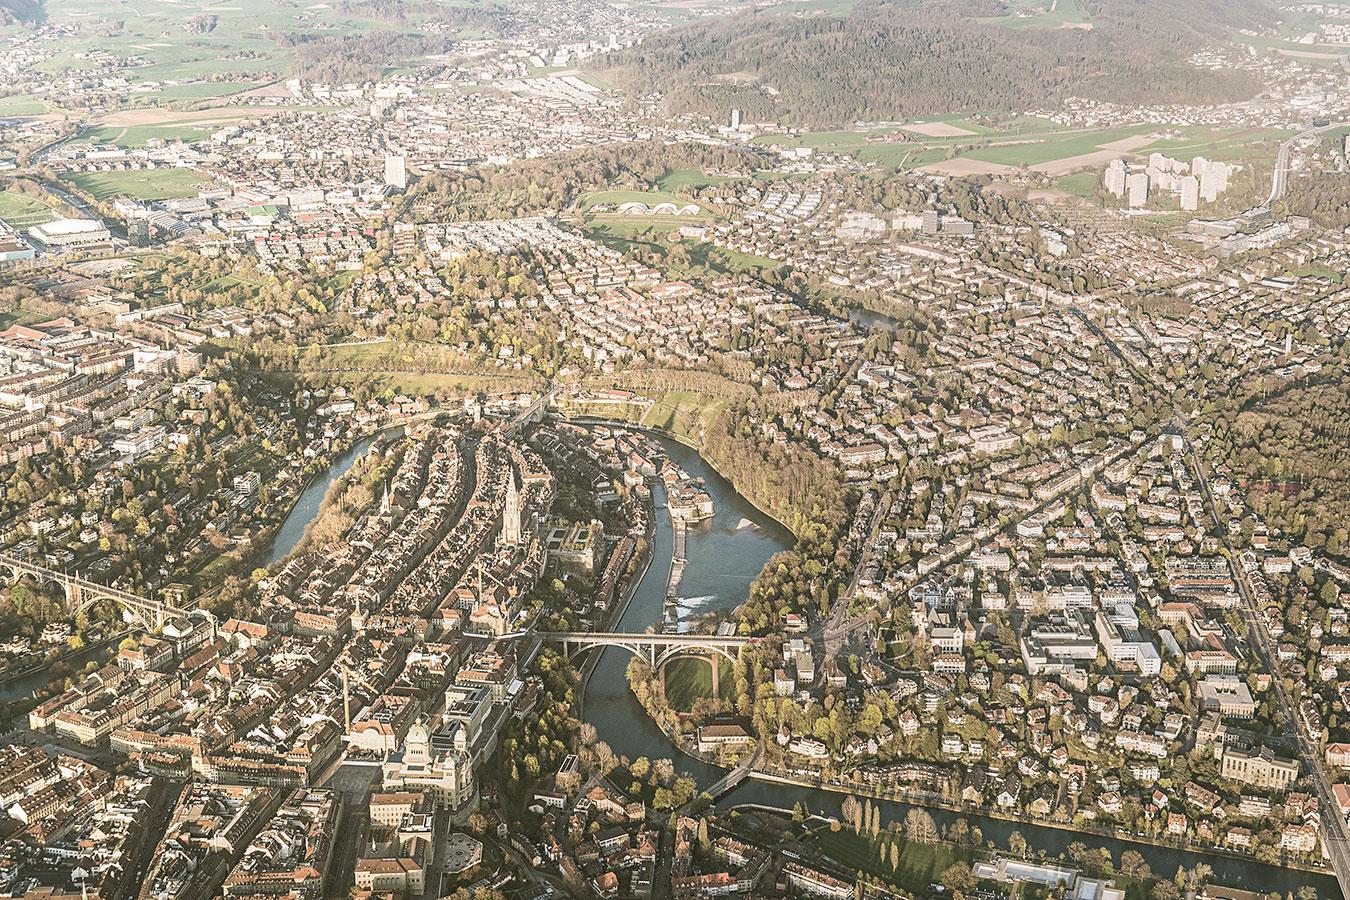 ch-peter-burkhard-2018-bern-aerial-view.jpg